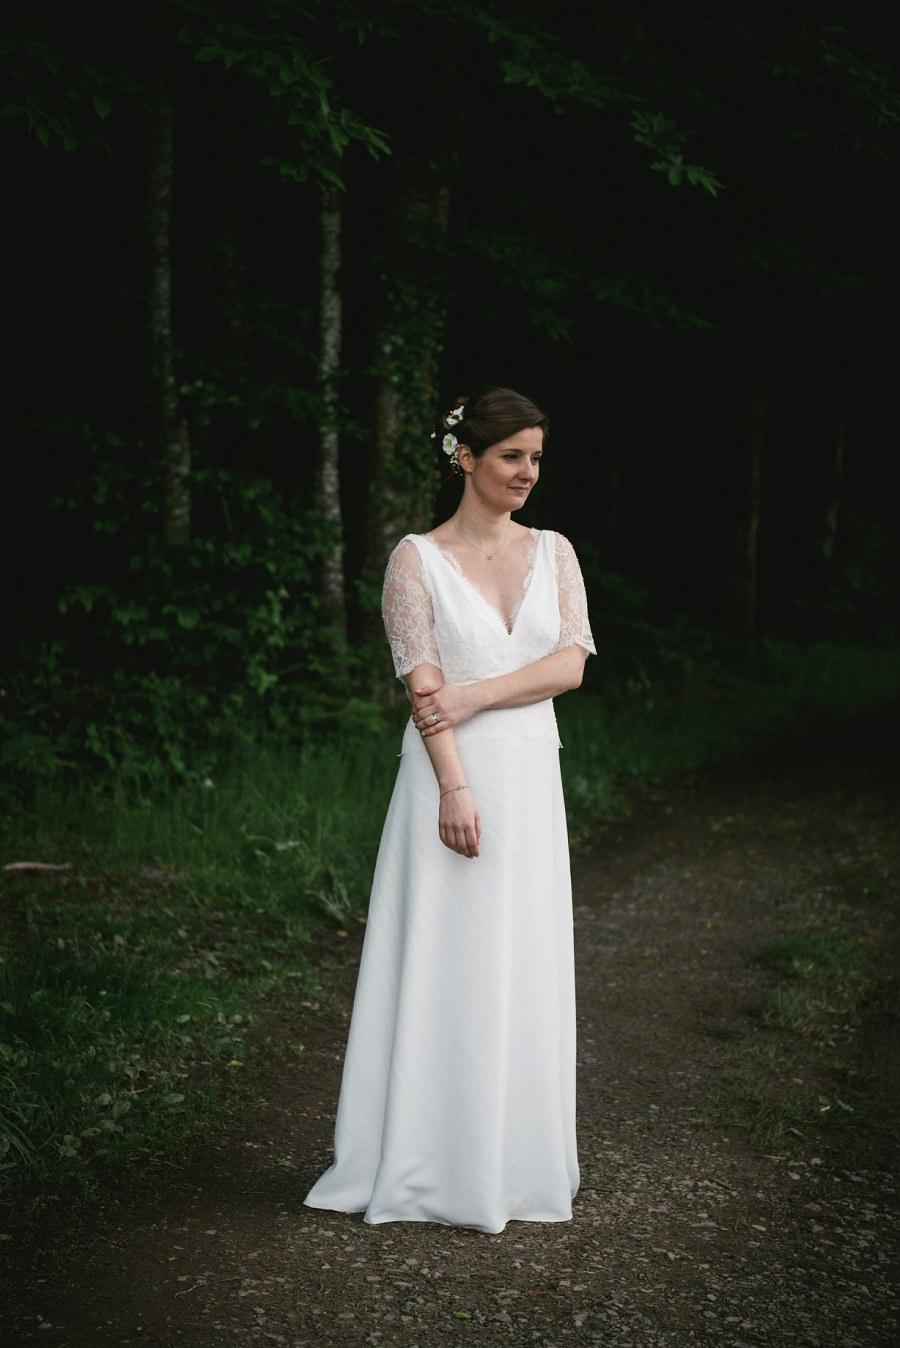 Wedding photographer nouméa